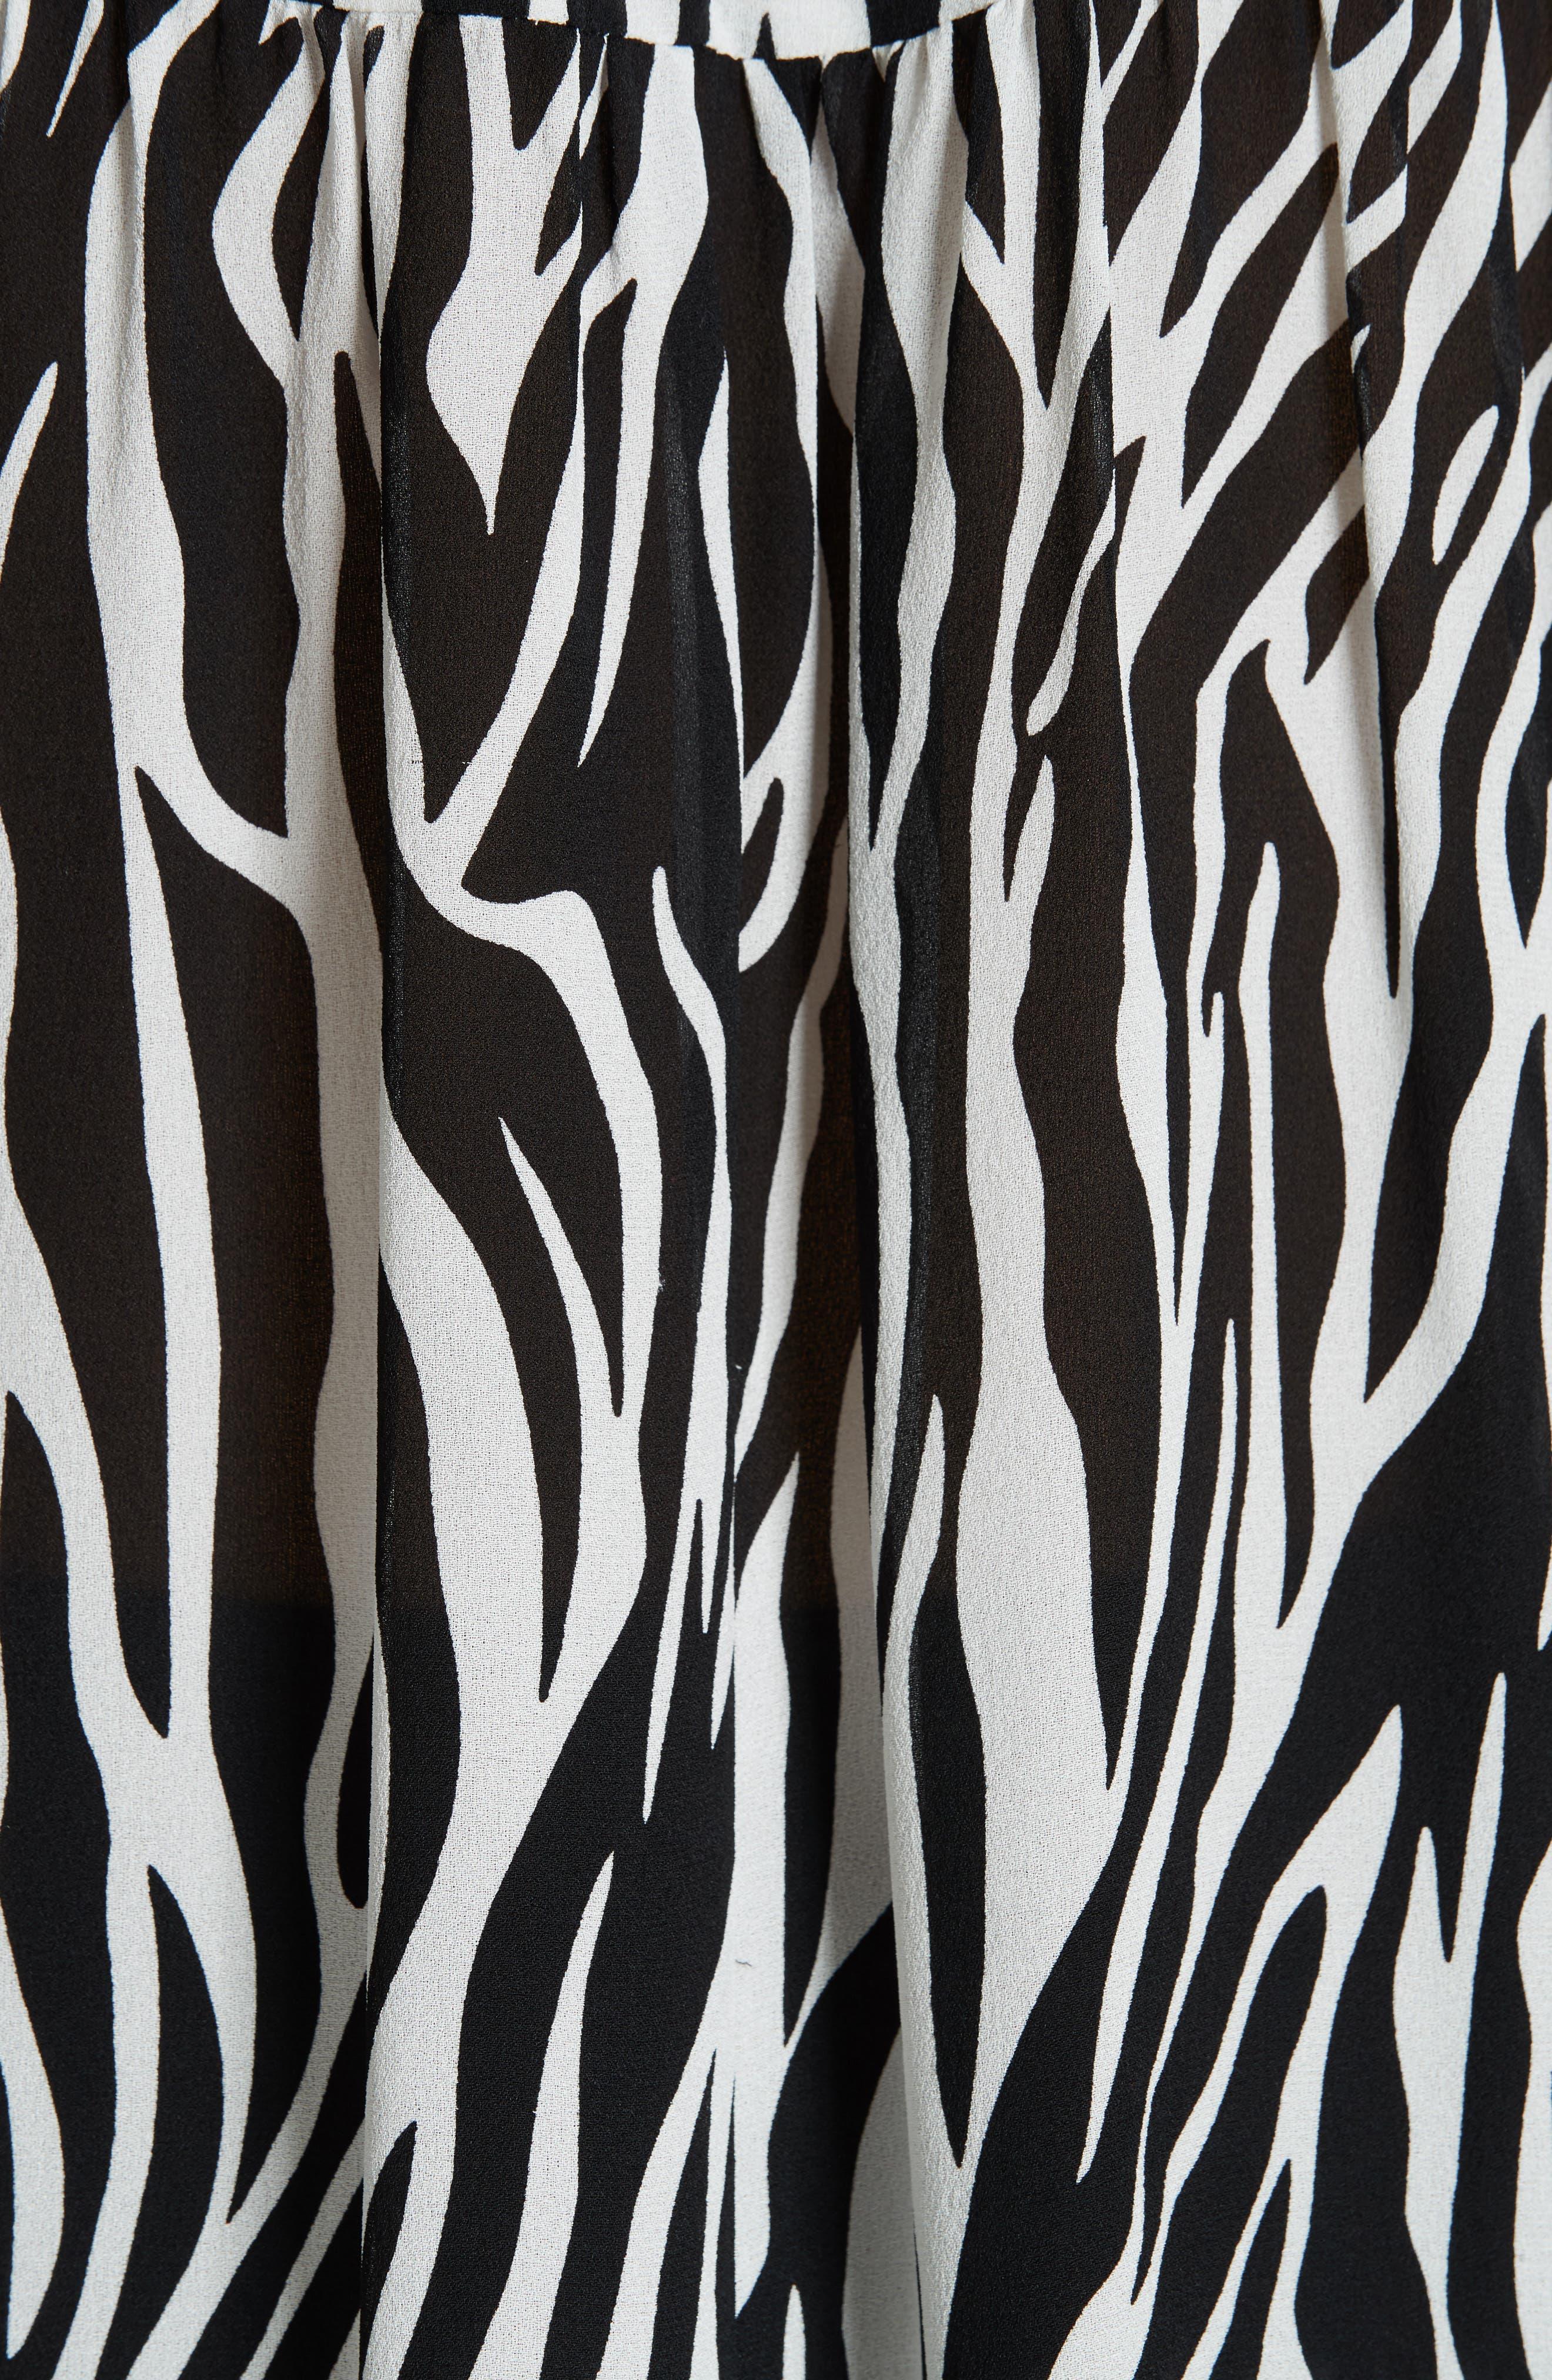 Zebra Print Tie Cuff Blouse,                             Alternate thumbnail 5, color,                             001